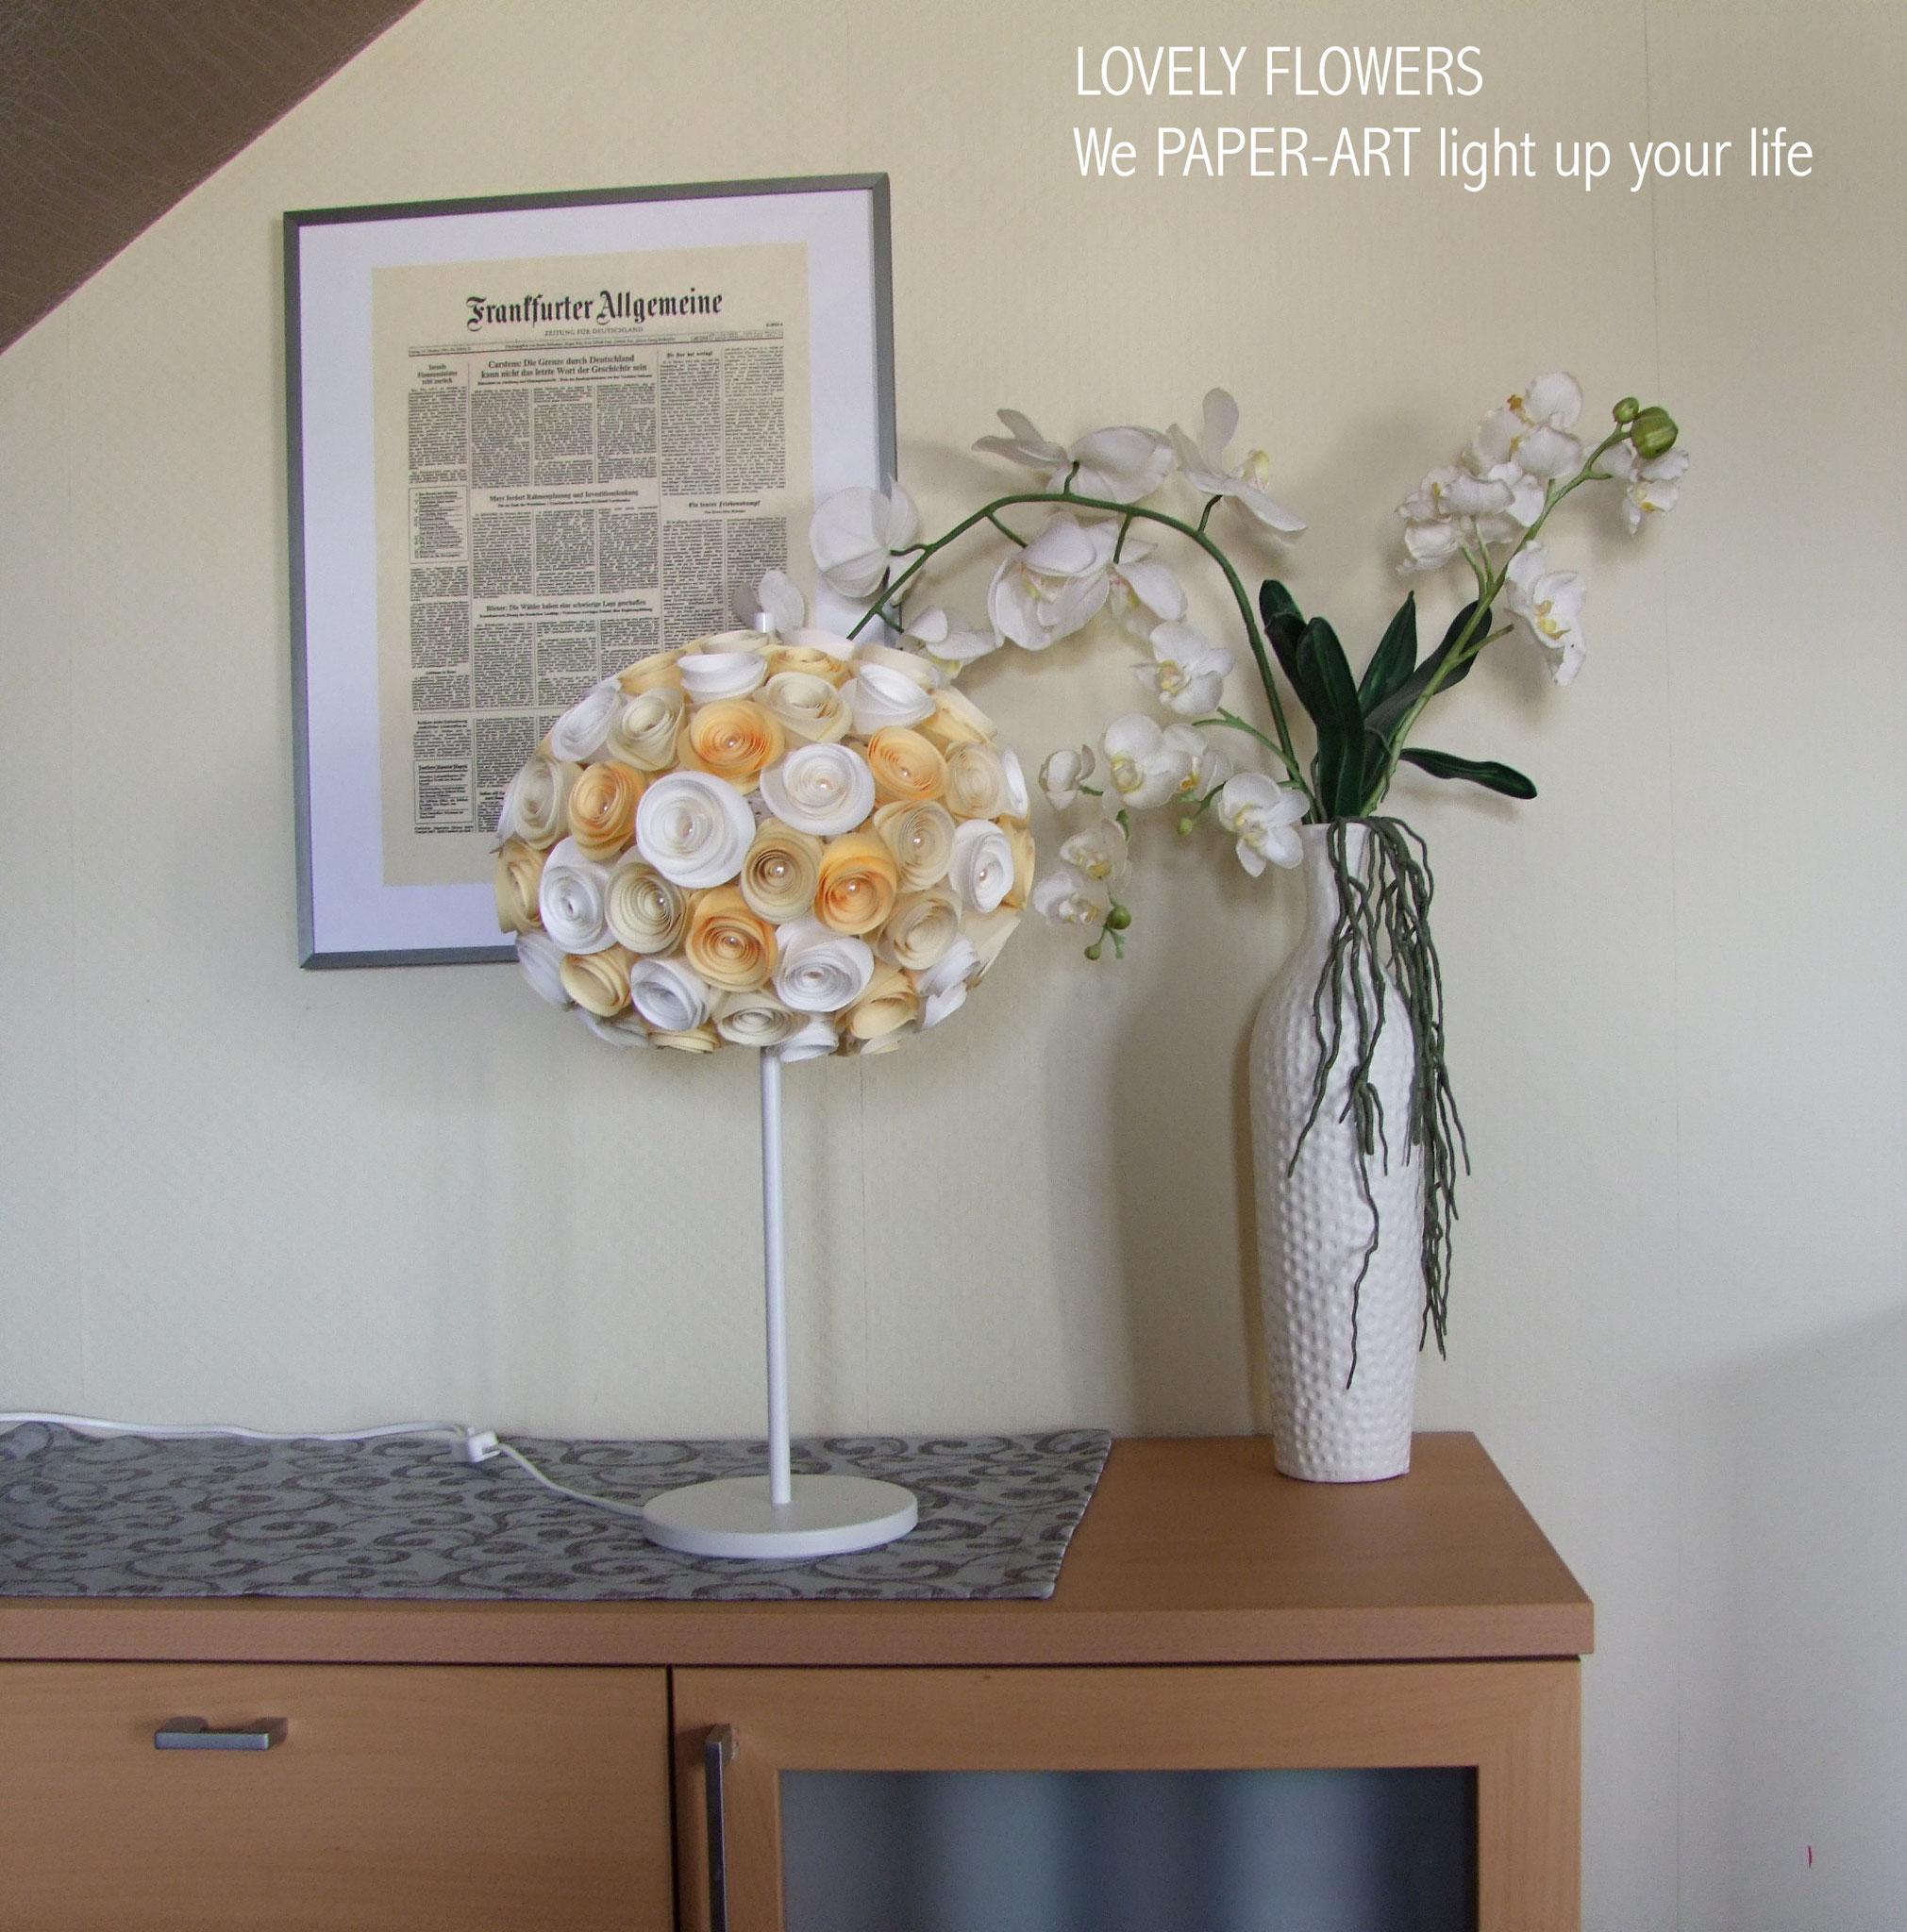 www.lovelyflowers.de - Paper Art Lampen gibt es in edlen oder hippen Farben!